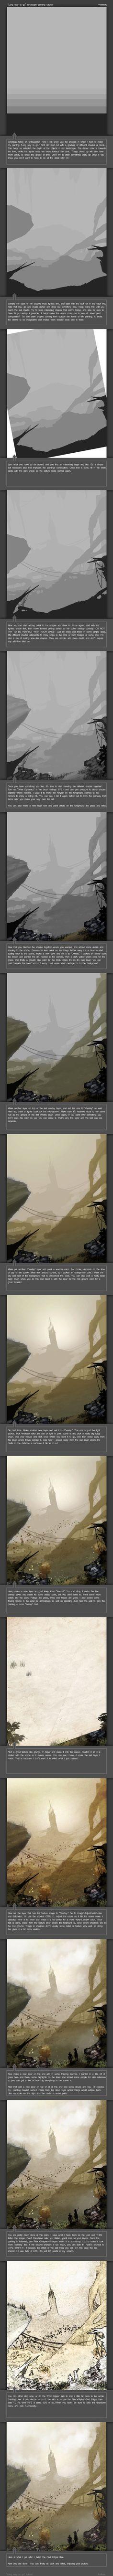 Environment Painting Tutorial by thefireis.deviantart.com on @deviantART